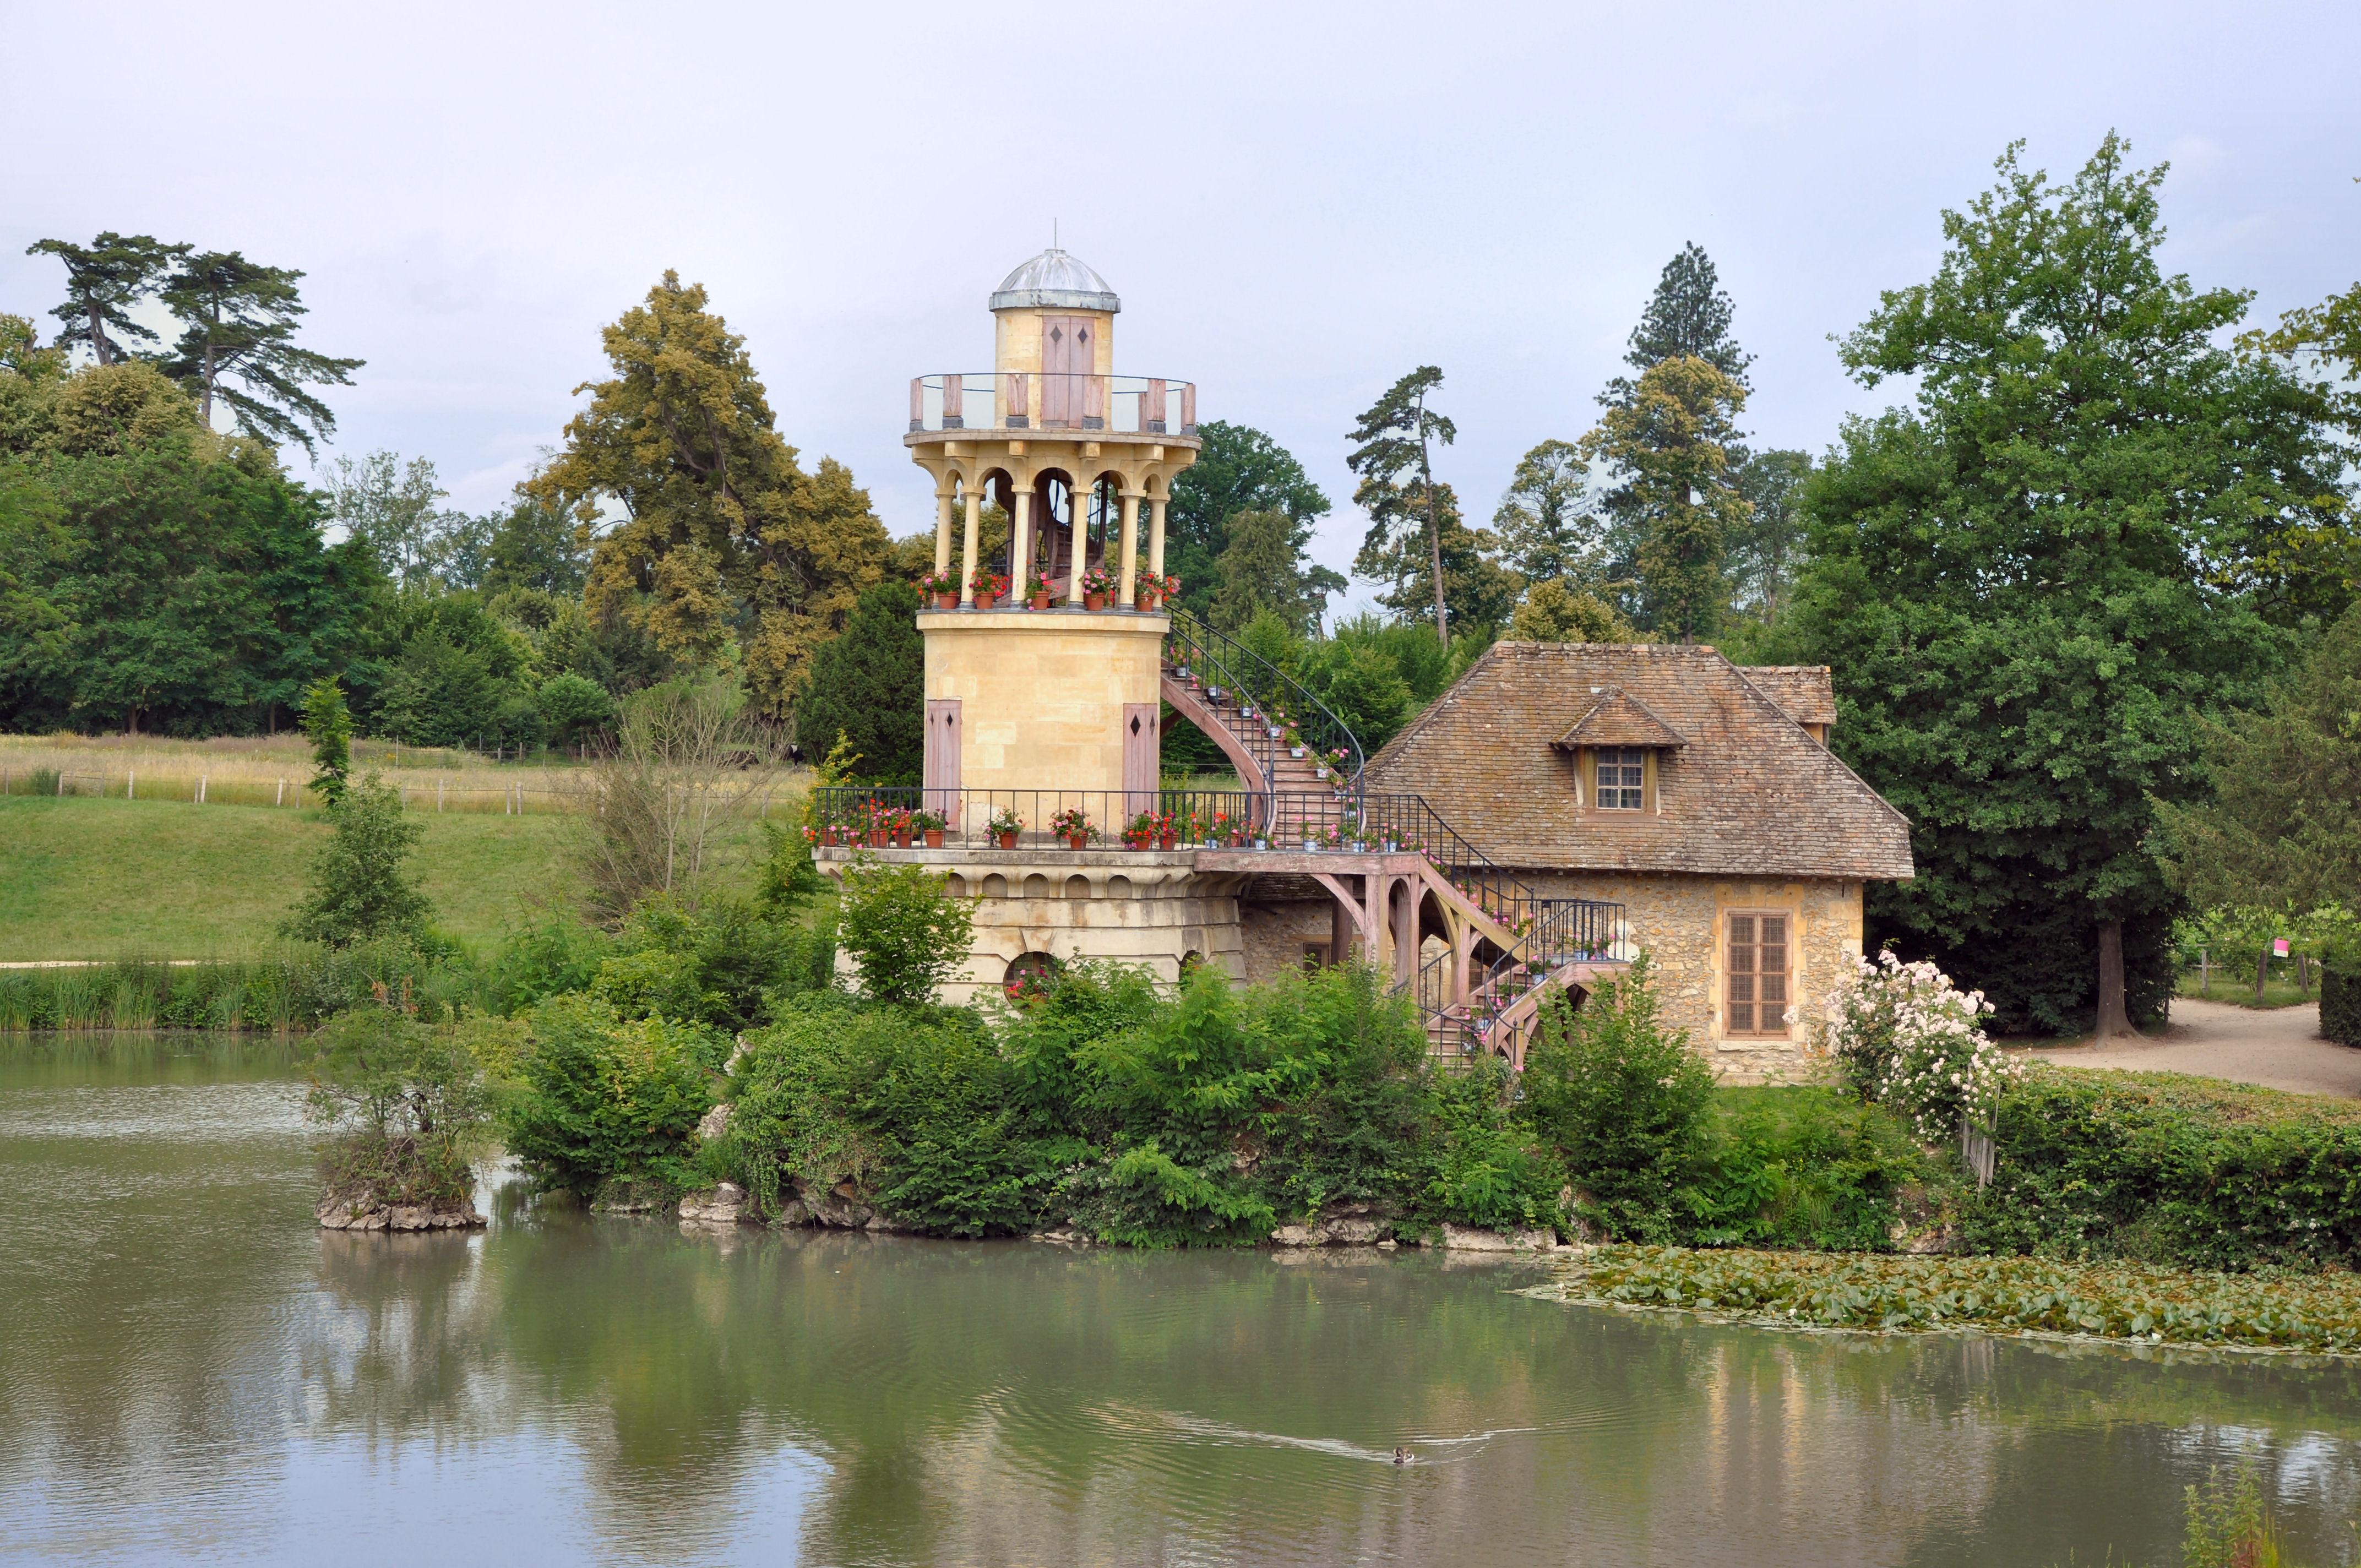 http://upload.wikimedia.org/wikipedia/commons/e/e9/Tour_Marlborough_et_laiterie.jpg